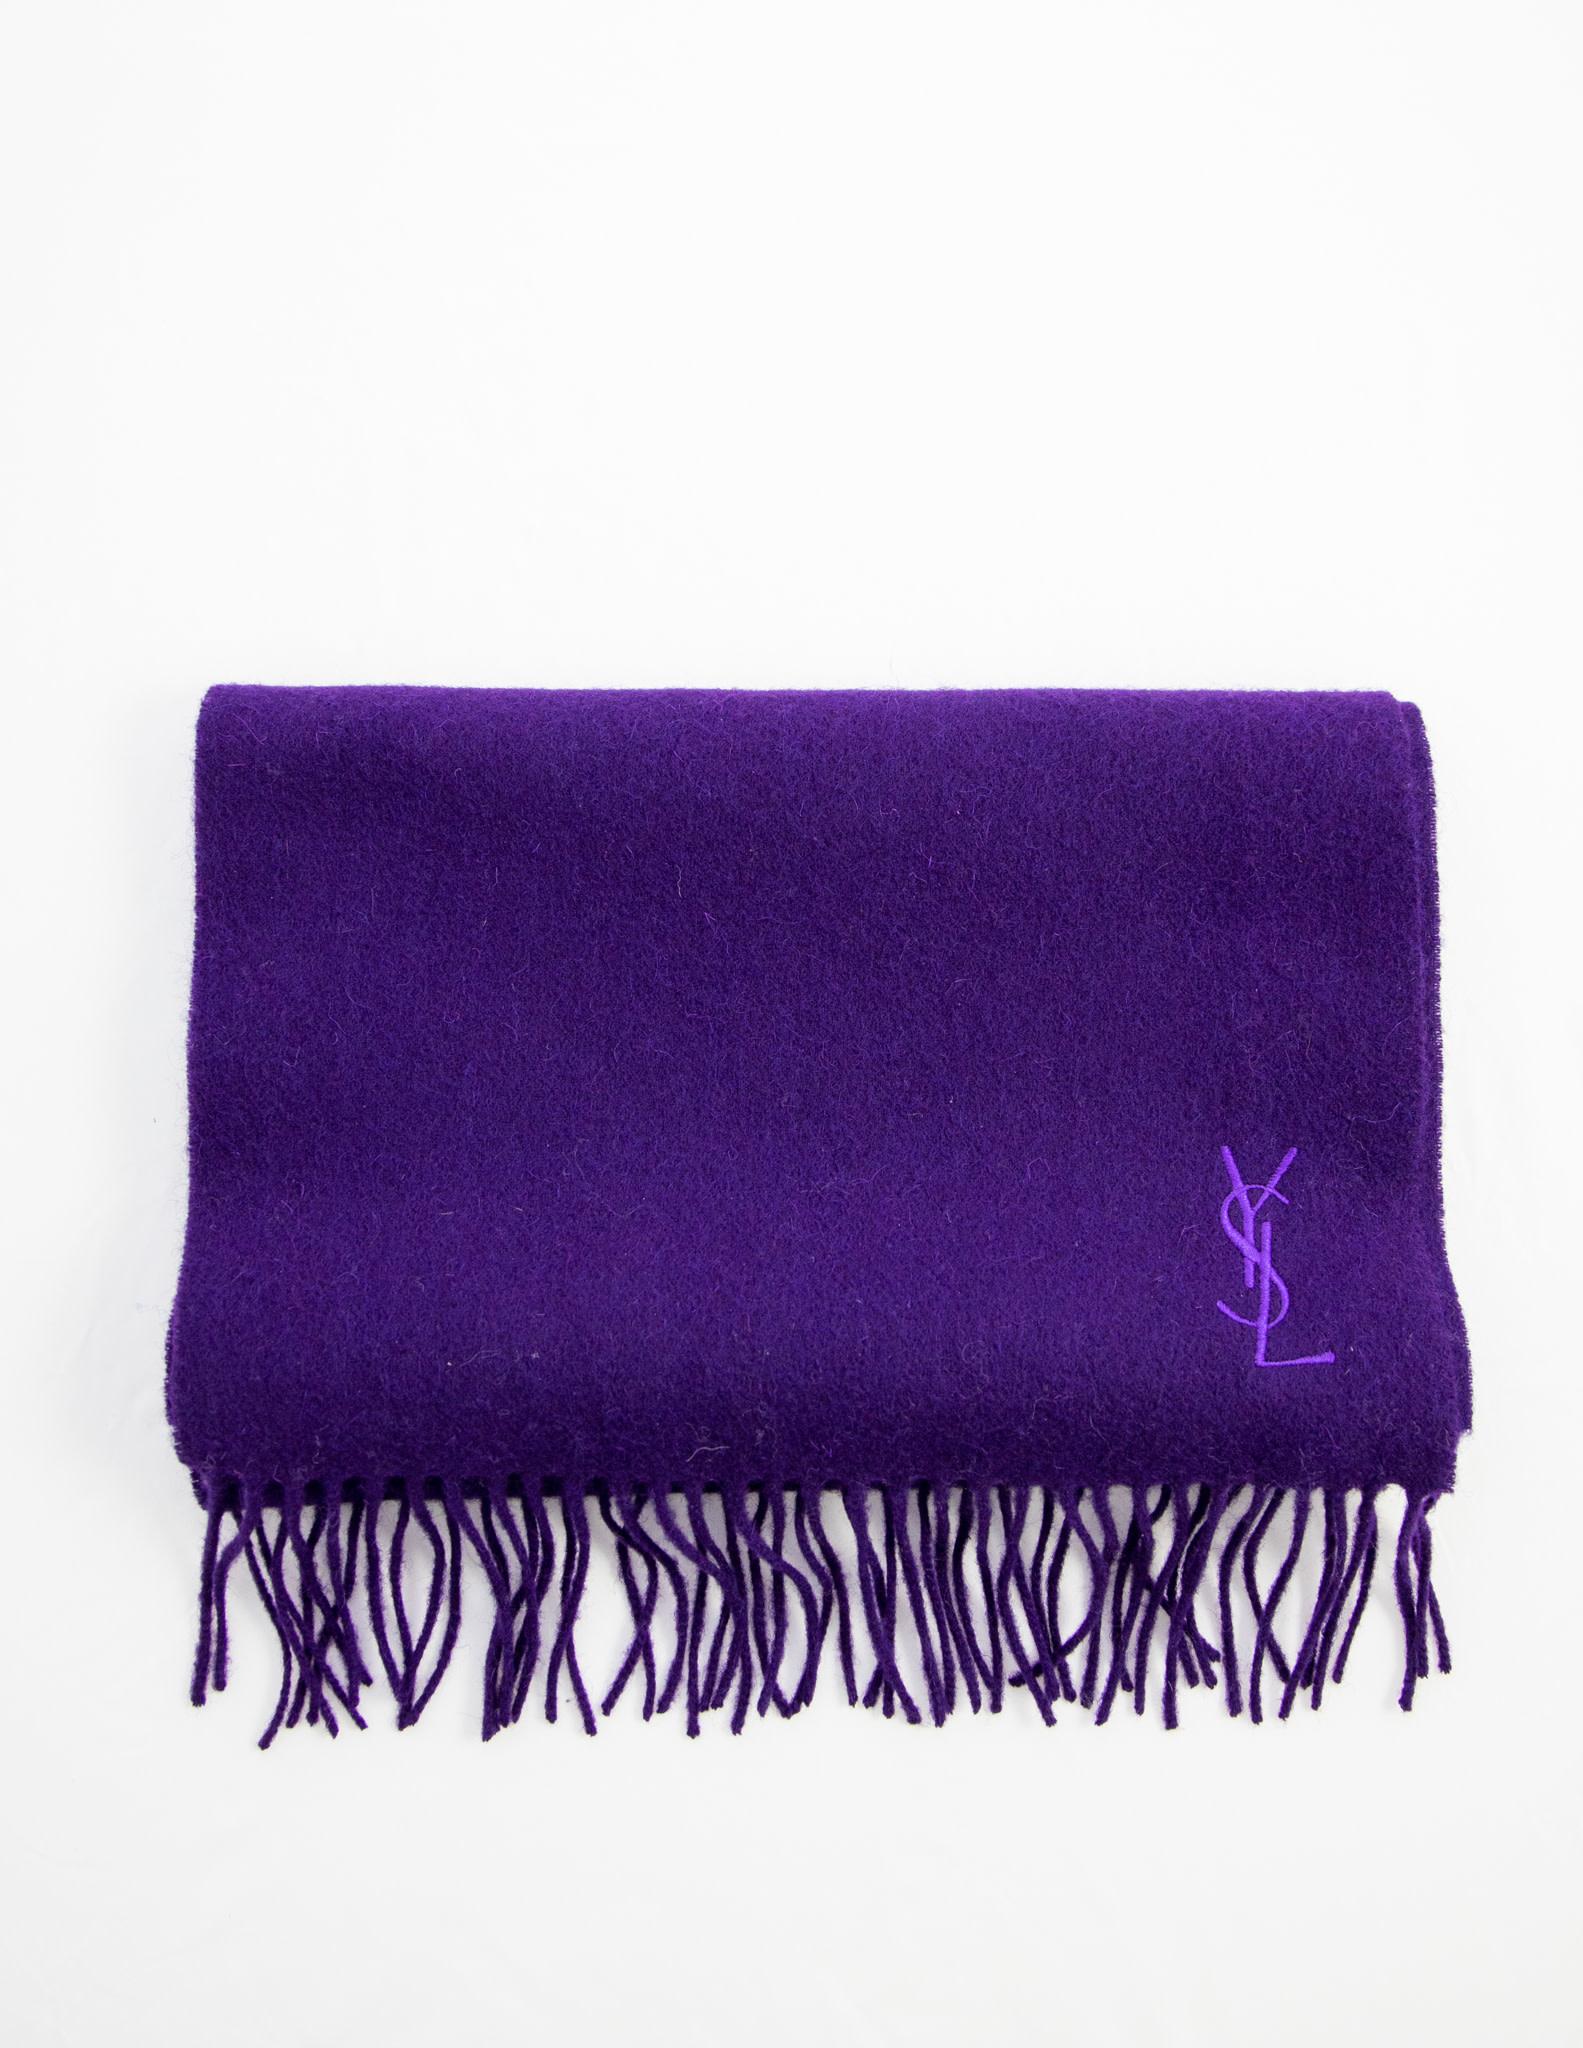 Yves Saint Laurent Purple Wool Scarf